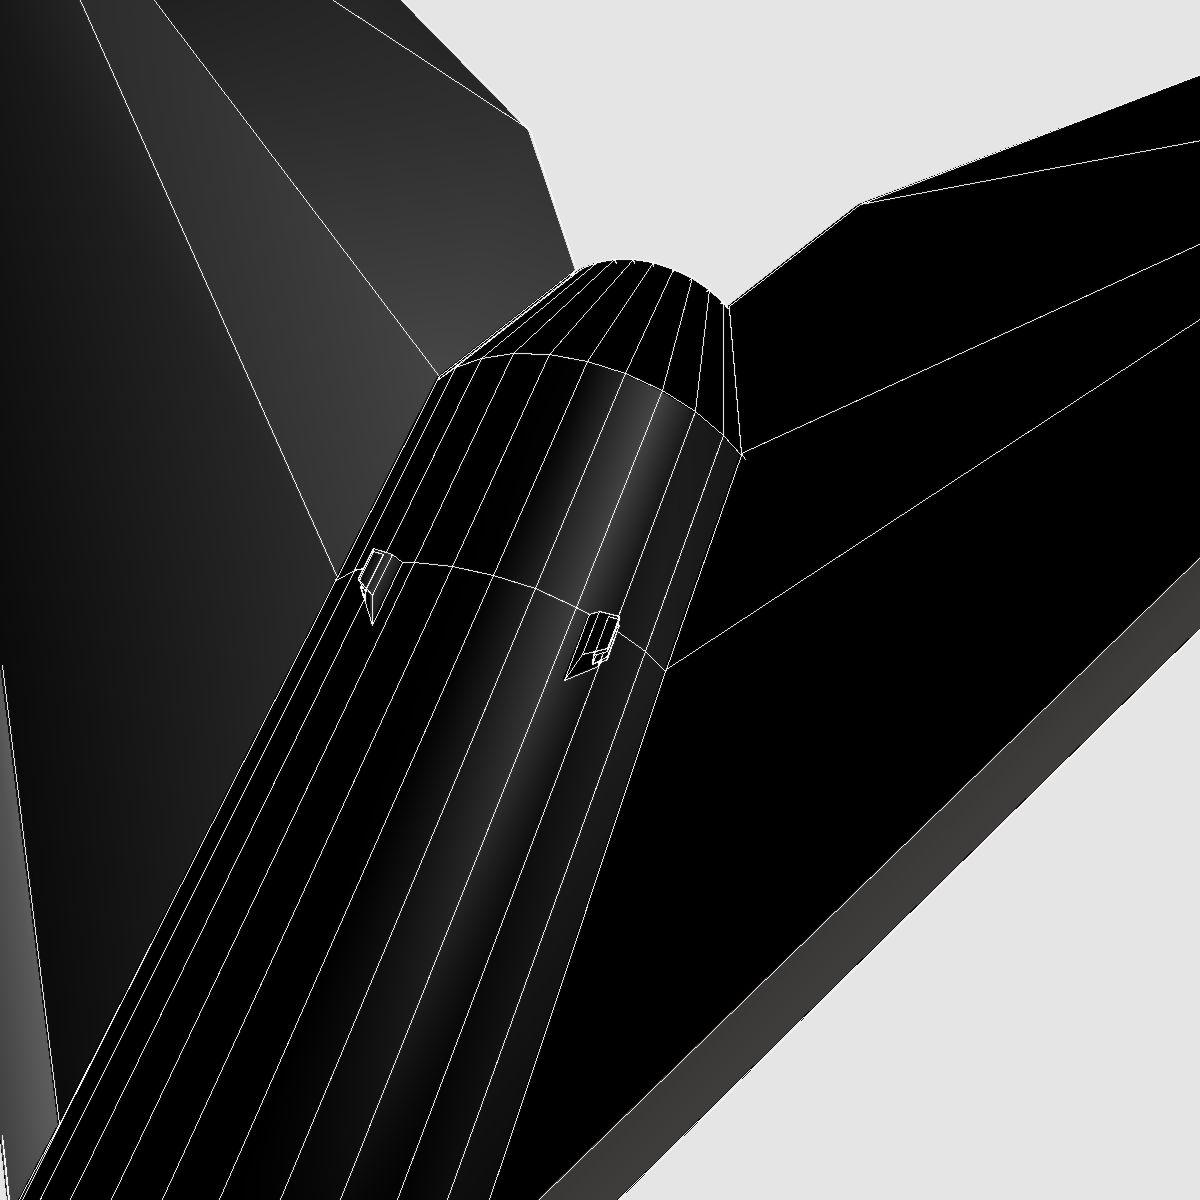 black brant ii sounding rocket 3d model 3ds dxf cob x obj 150841